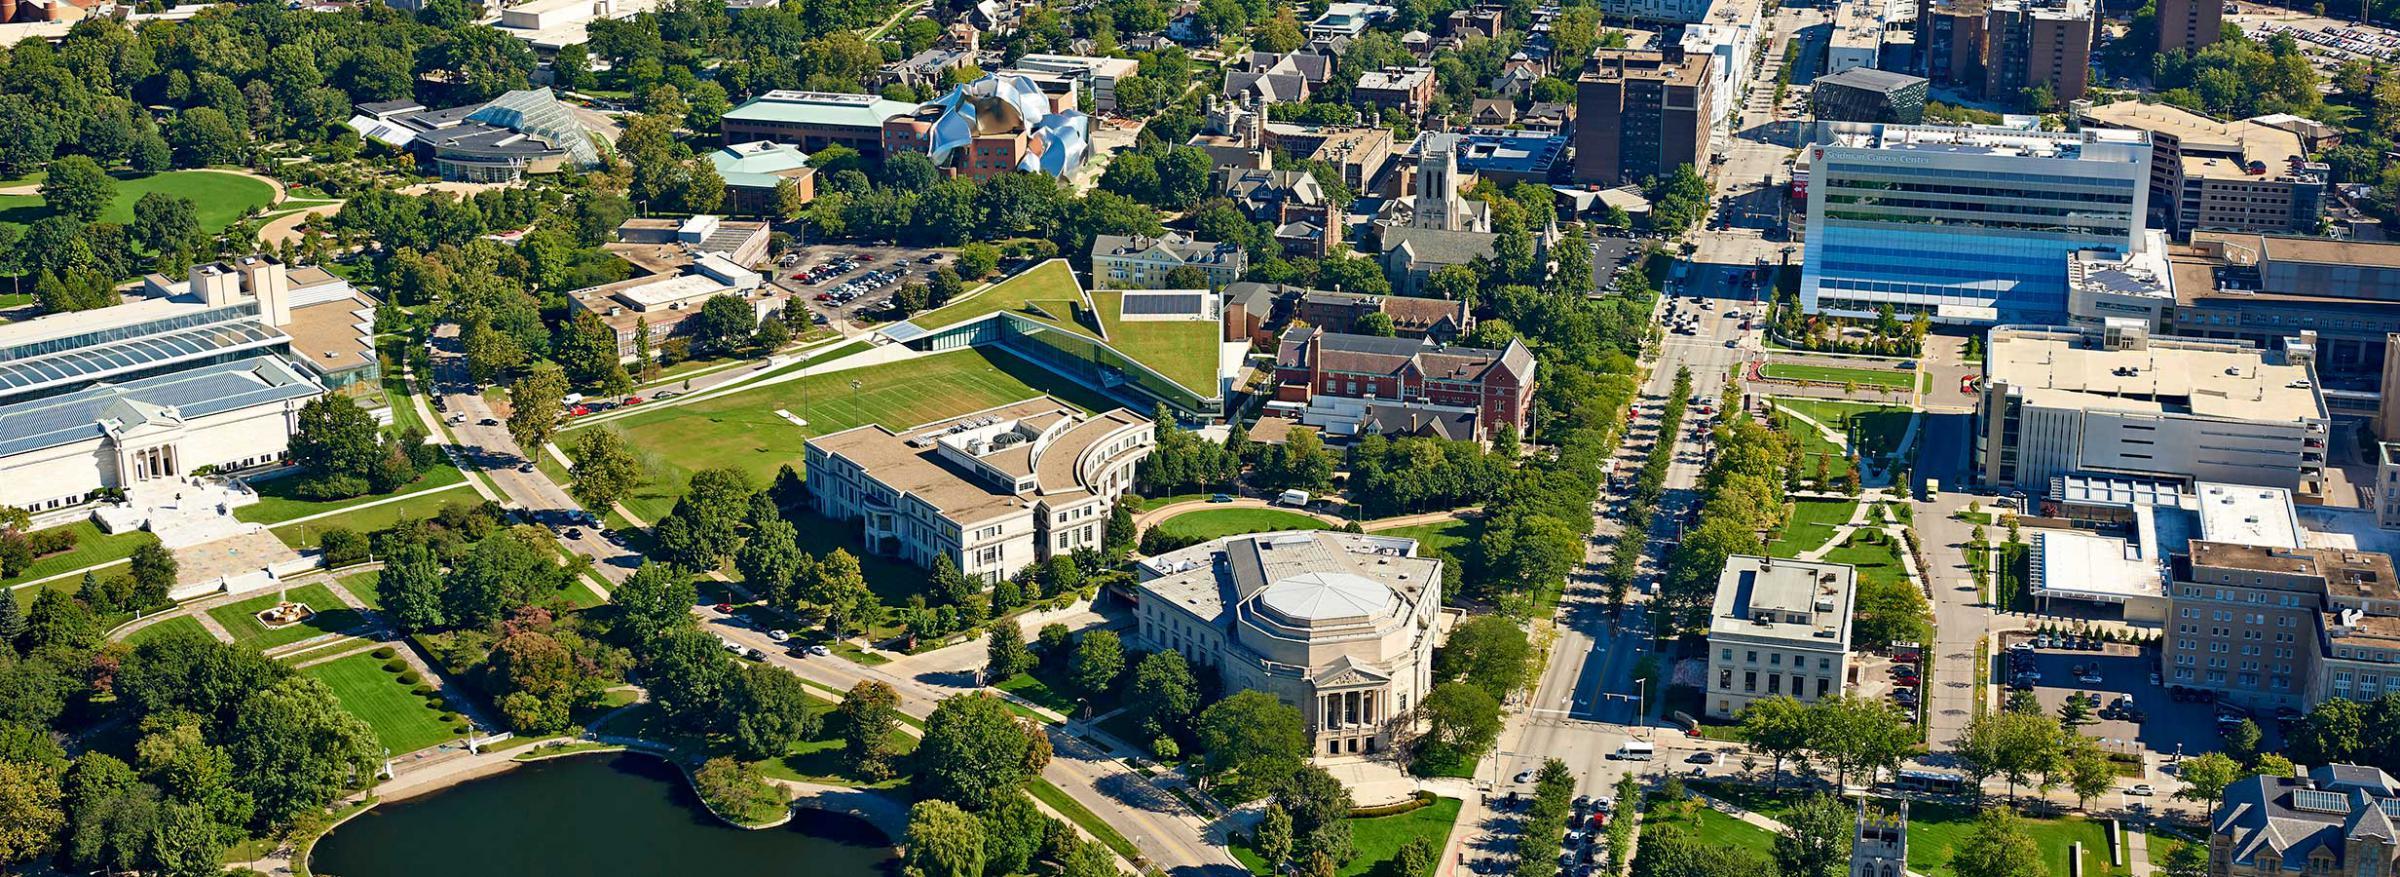 Case Western Reserve University Gets a Microscope Developed